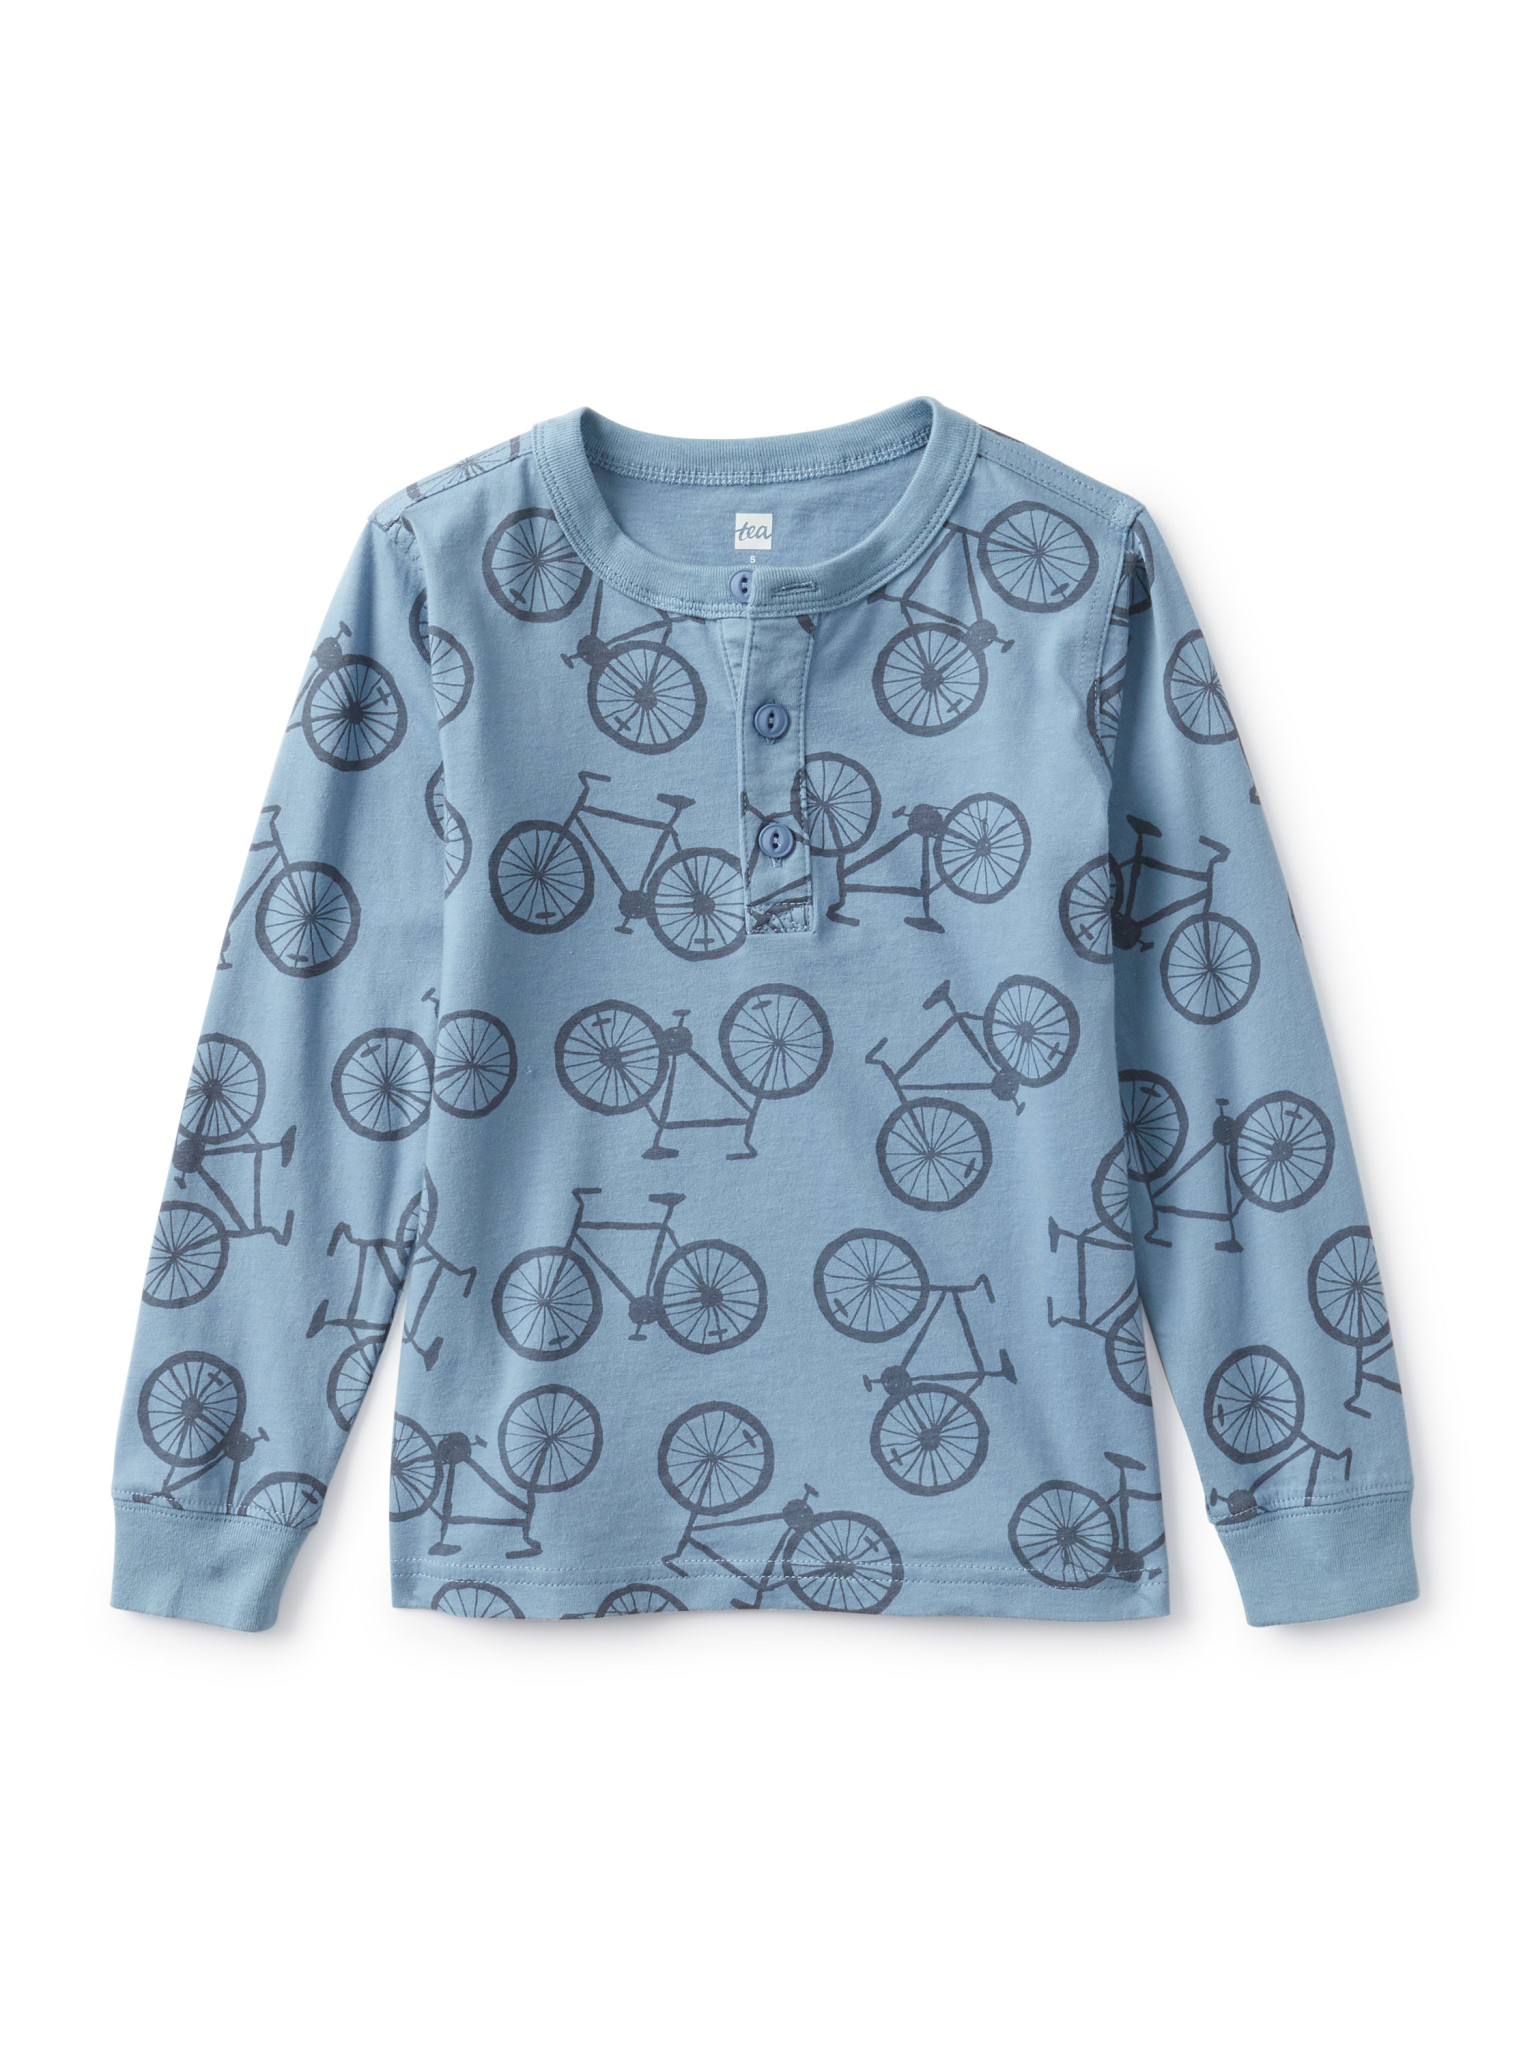 Tea Collection Henley Shirt - Pedal Power